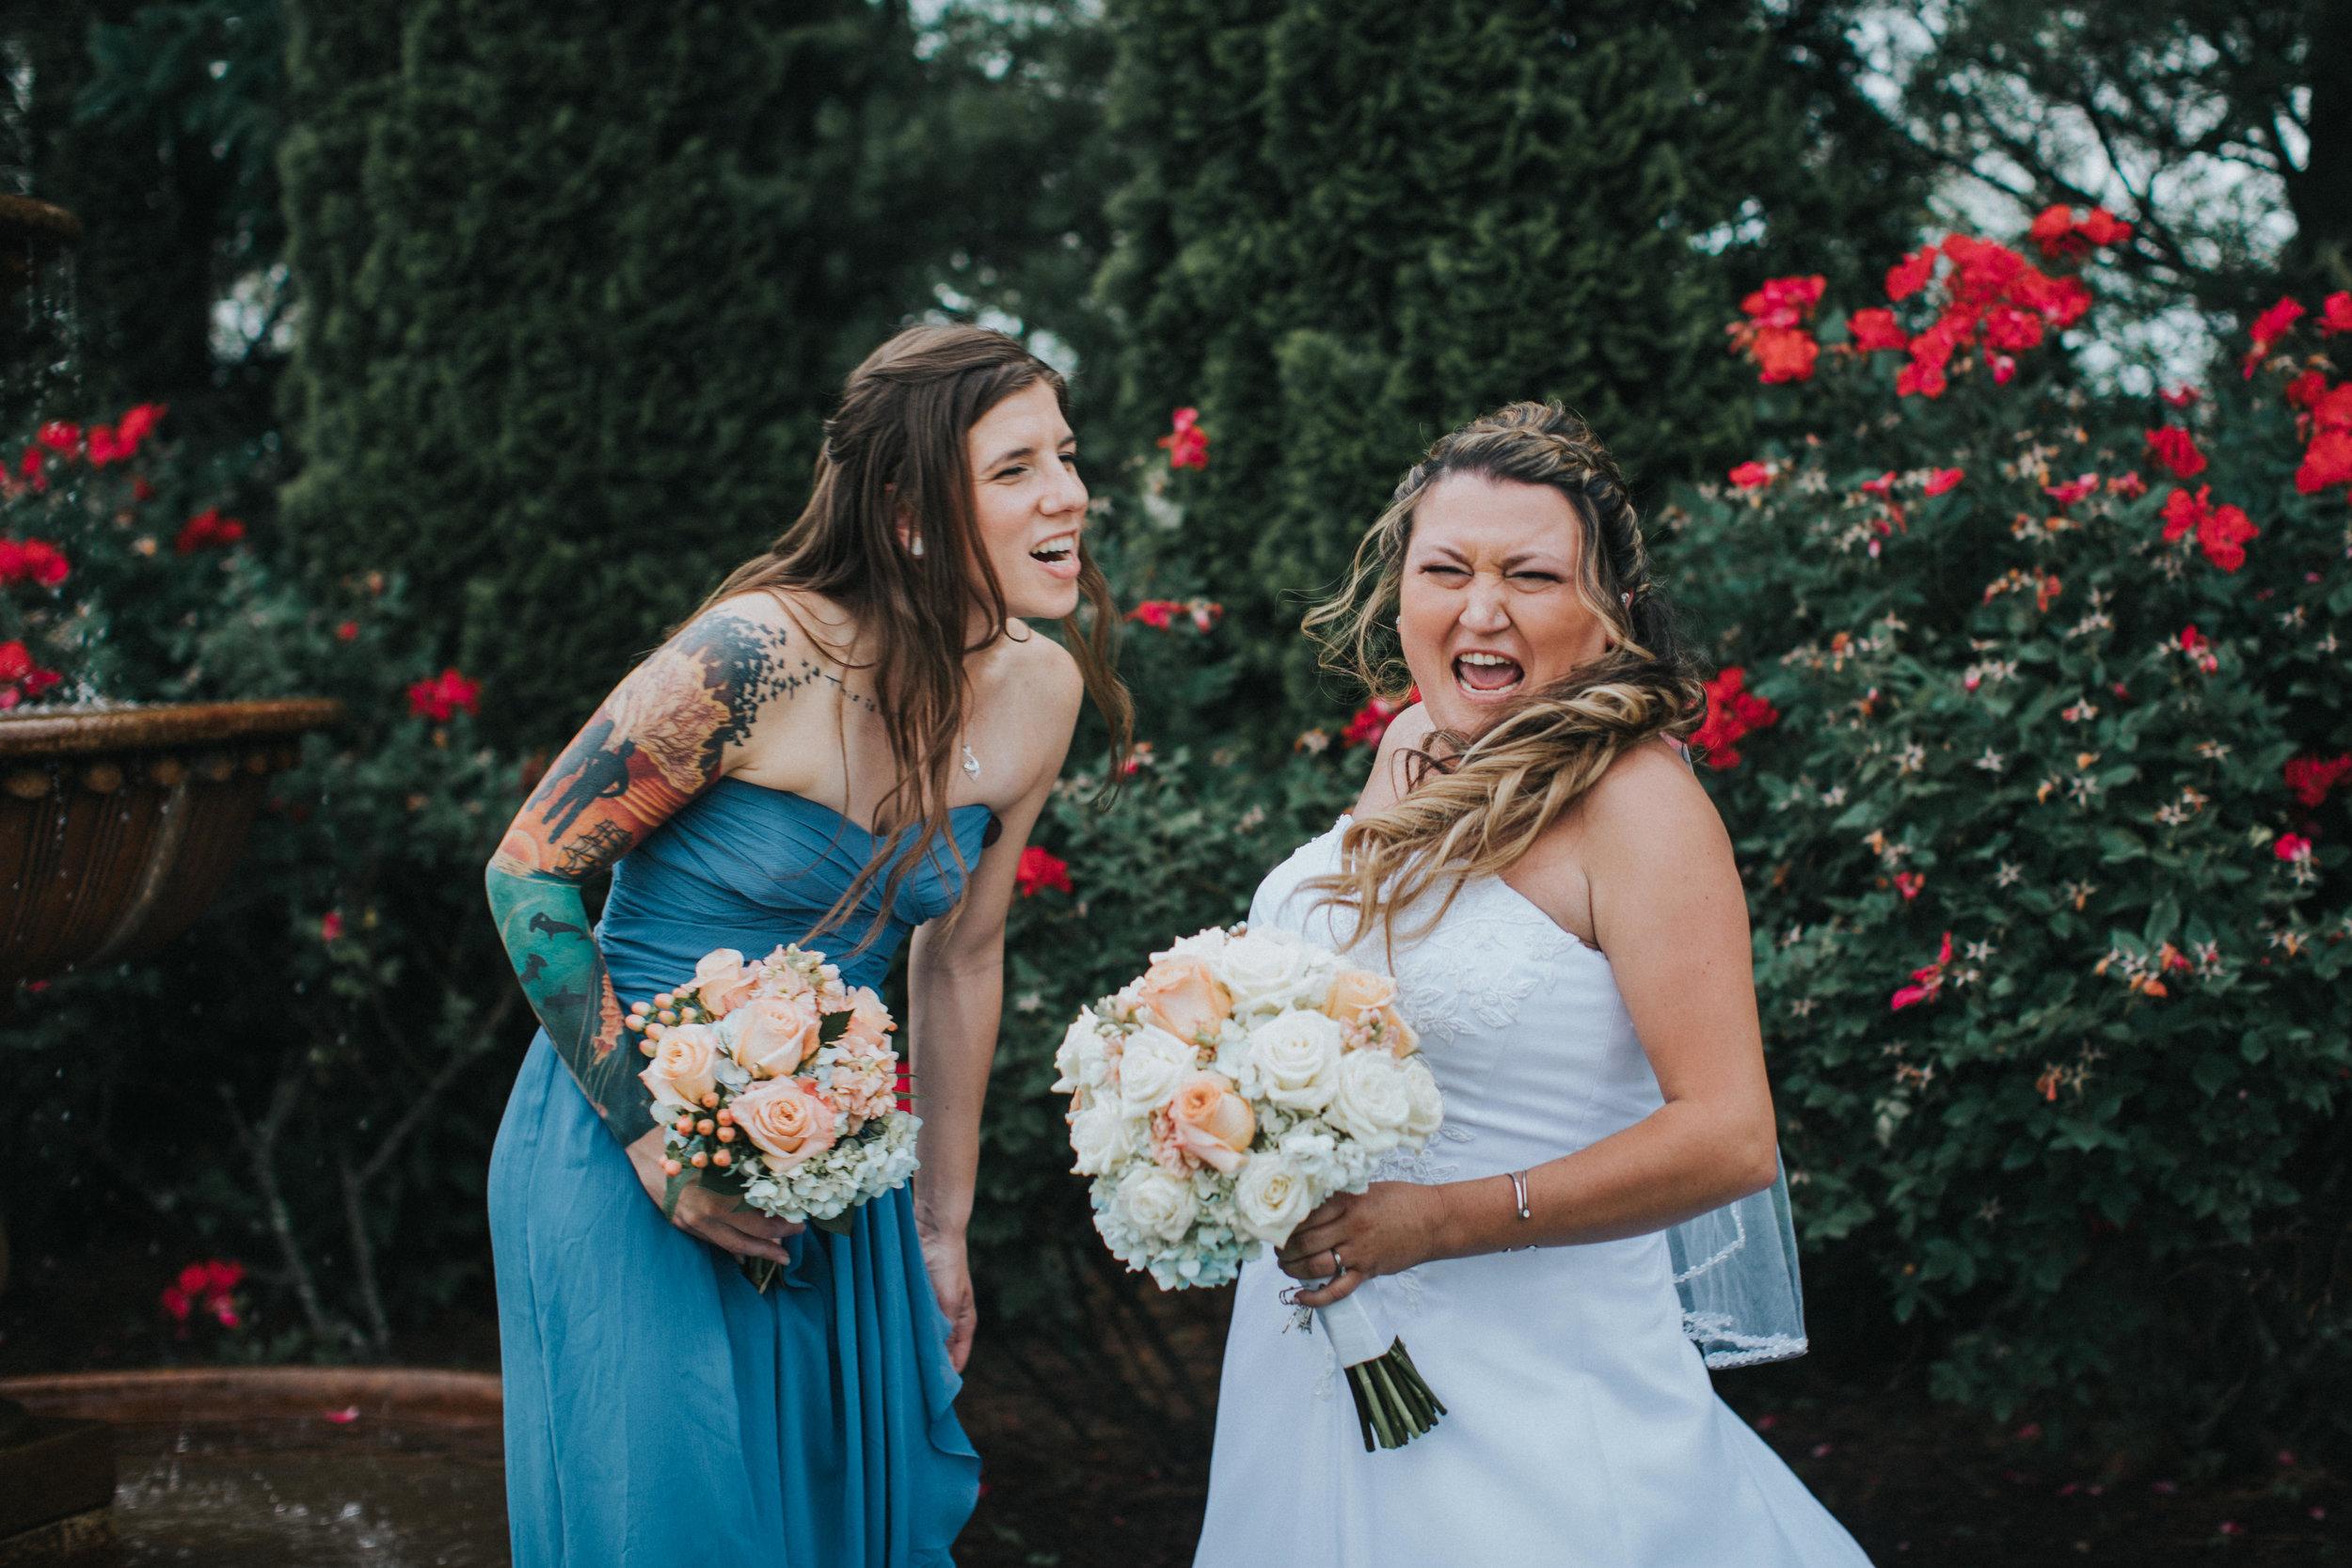 New-Jersey-Wedding-Photographer-JennaLynnPhotography-ValenzanoWinery-BridalParty-35.jpg